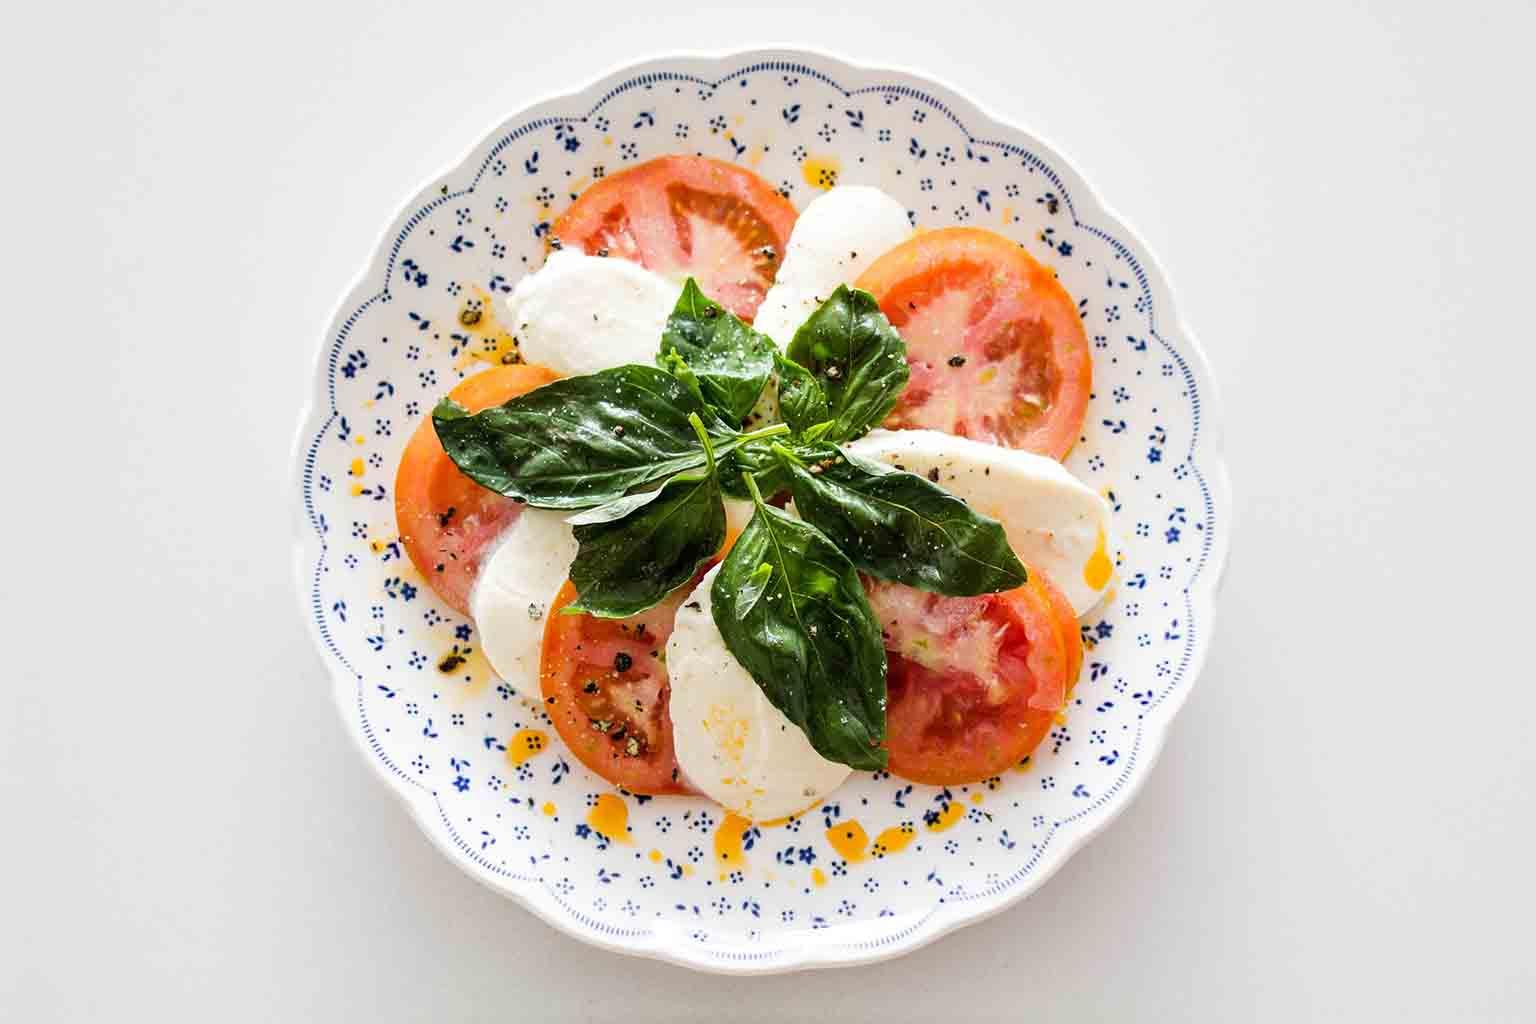 Granny Keto - Caprese salad makes a good breakfast for ketogenic eating